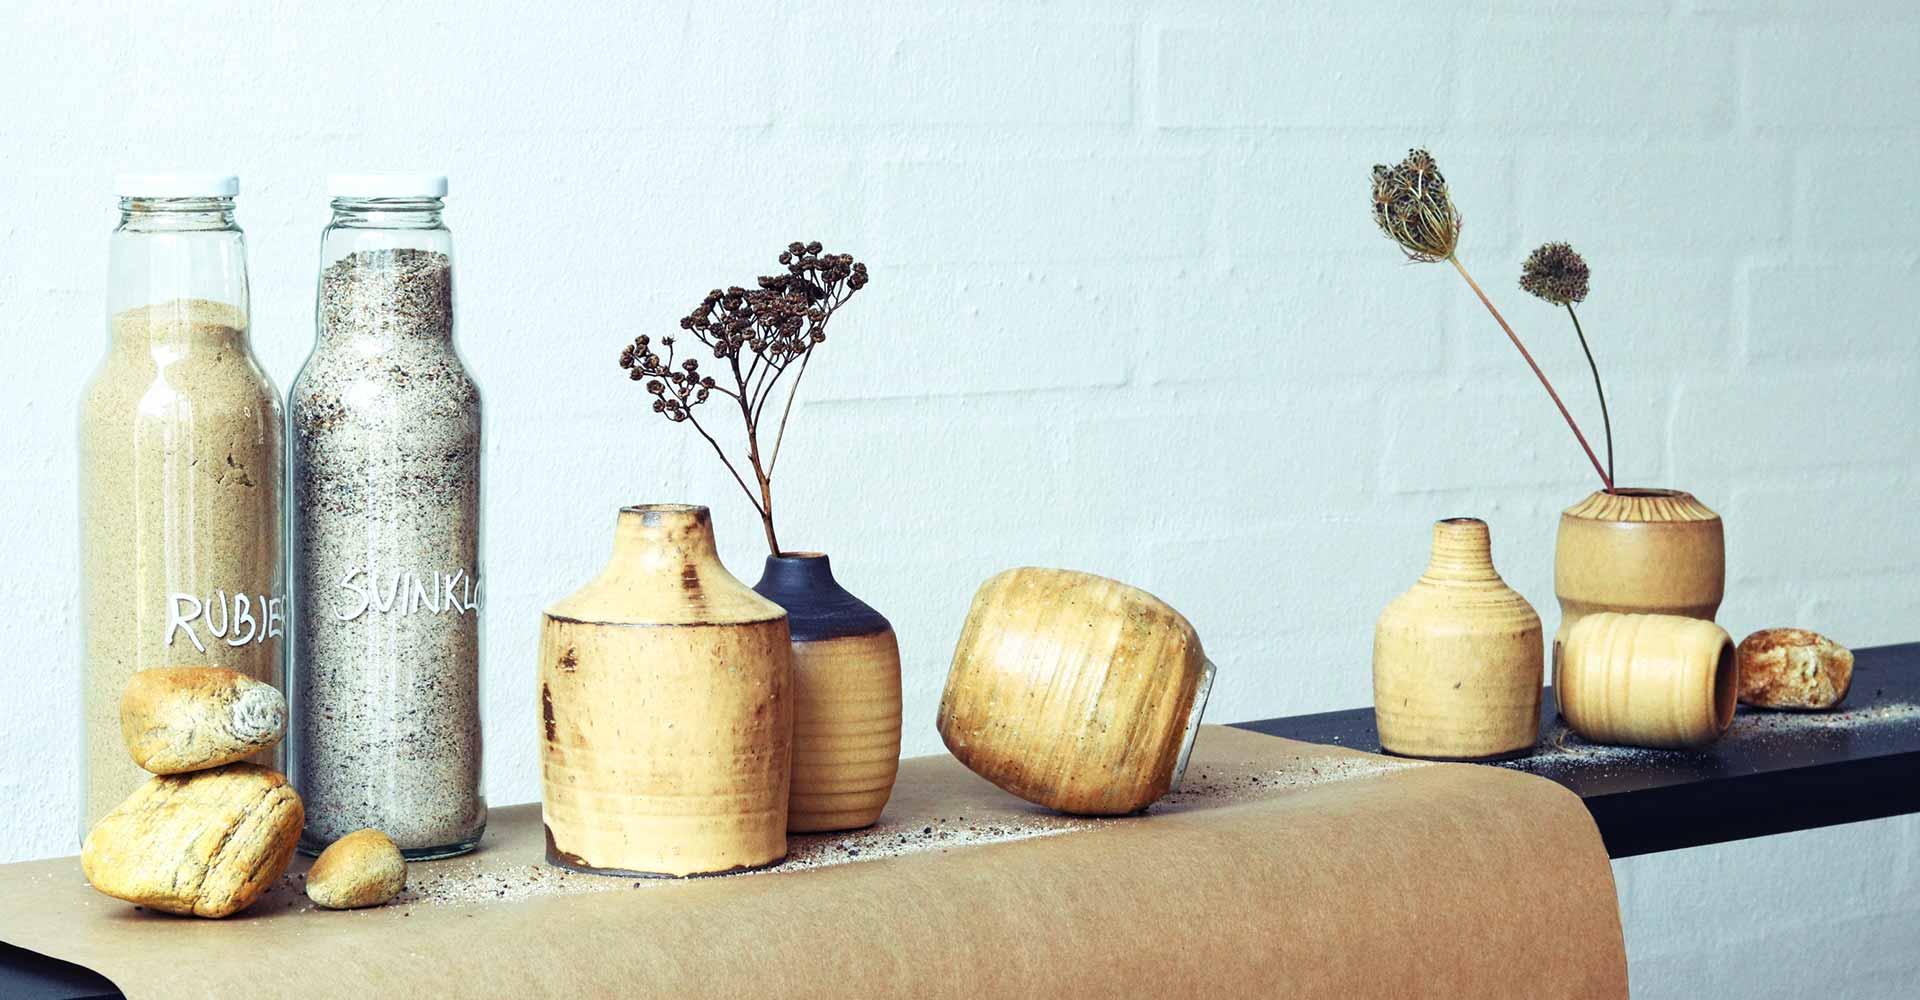 handmade ceramik vases and cups